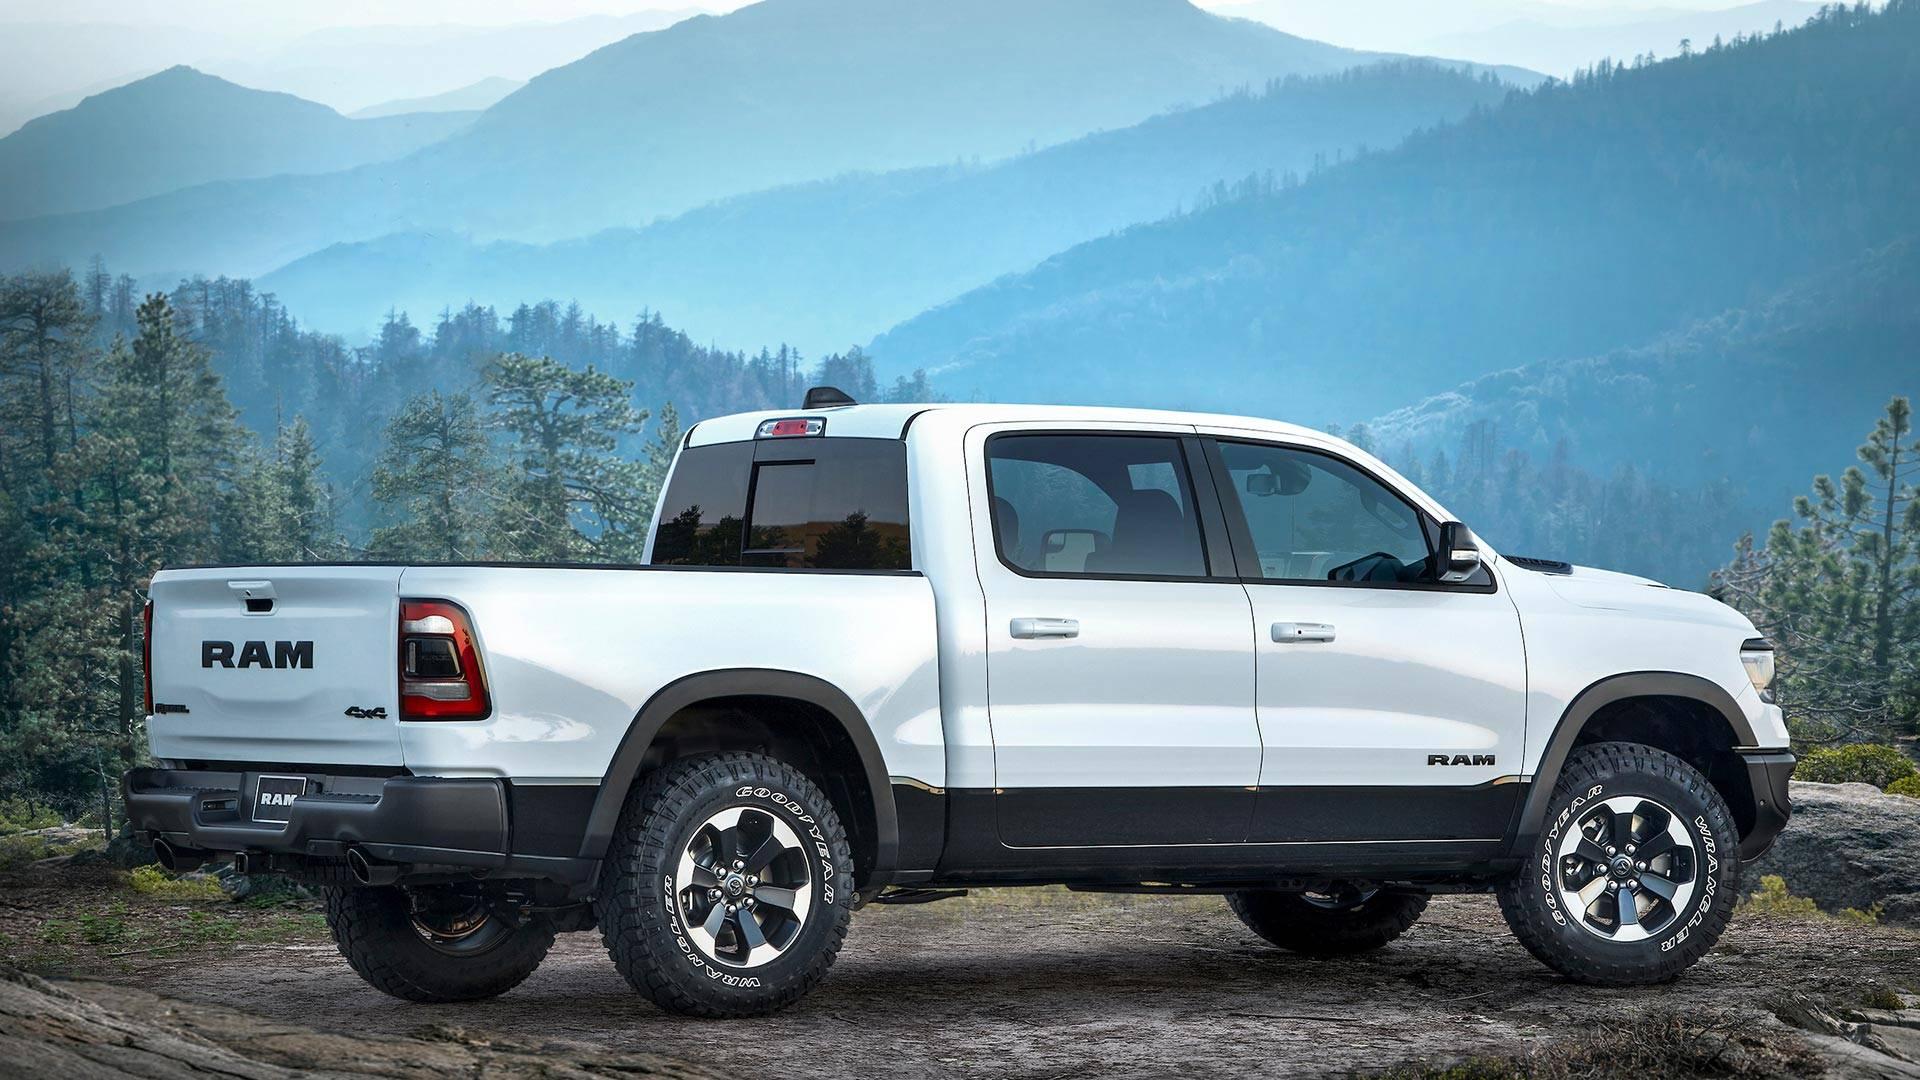 Ram Rebel Tr Expected With 7 0 Liter Banshee V8 Engine Autoevolution